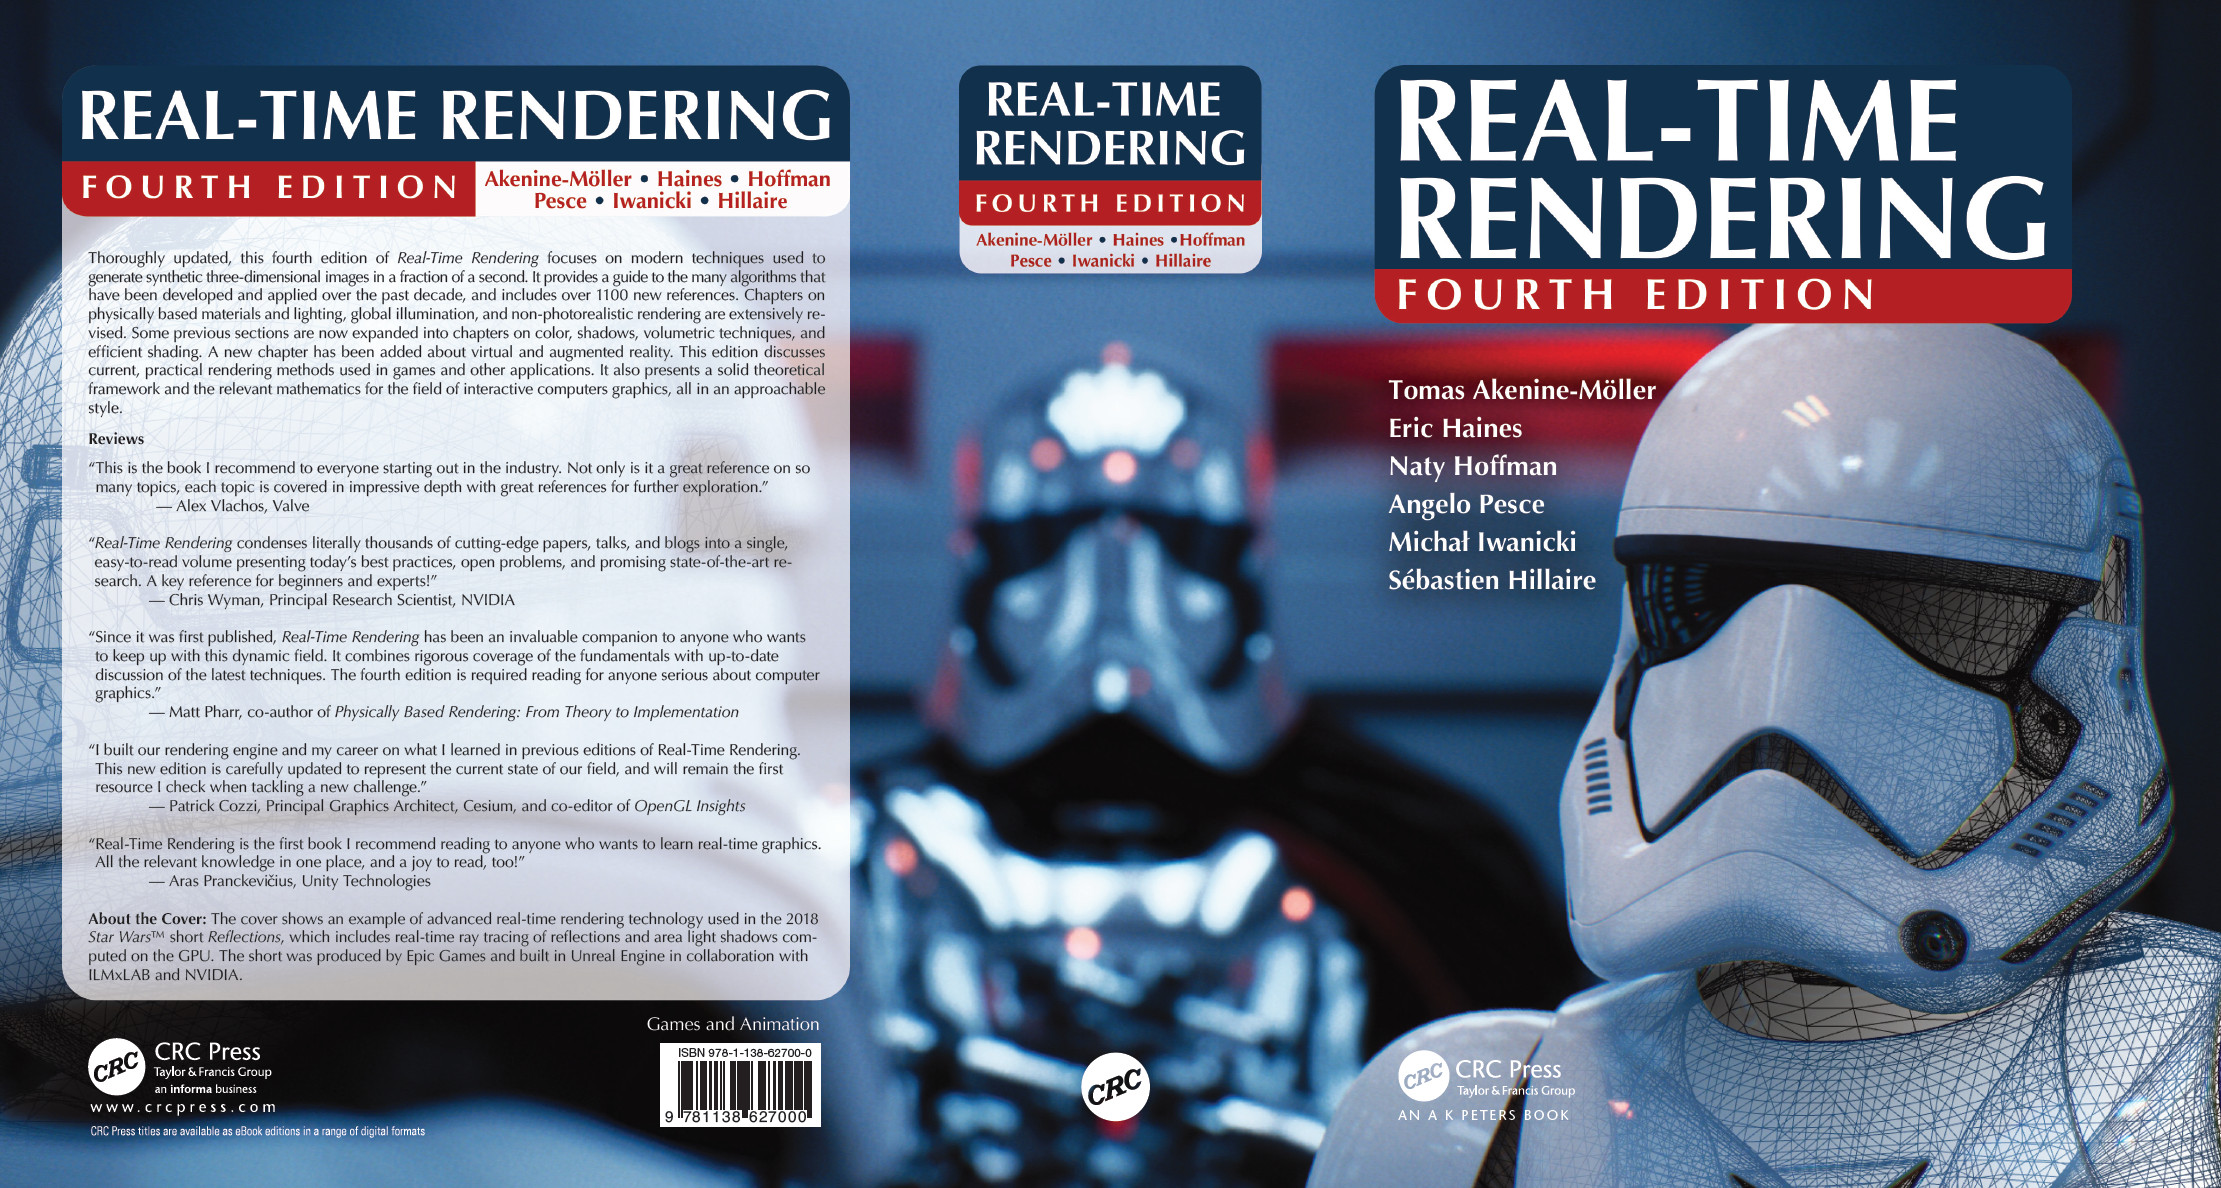 Fundamentals Of Game Design 3rd Edition Pdf